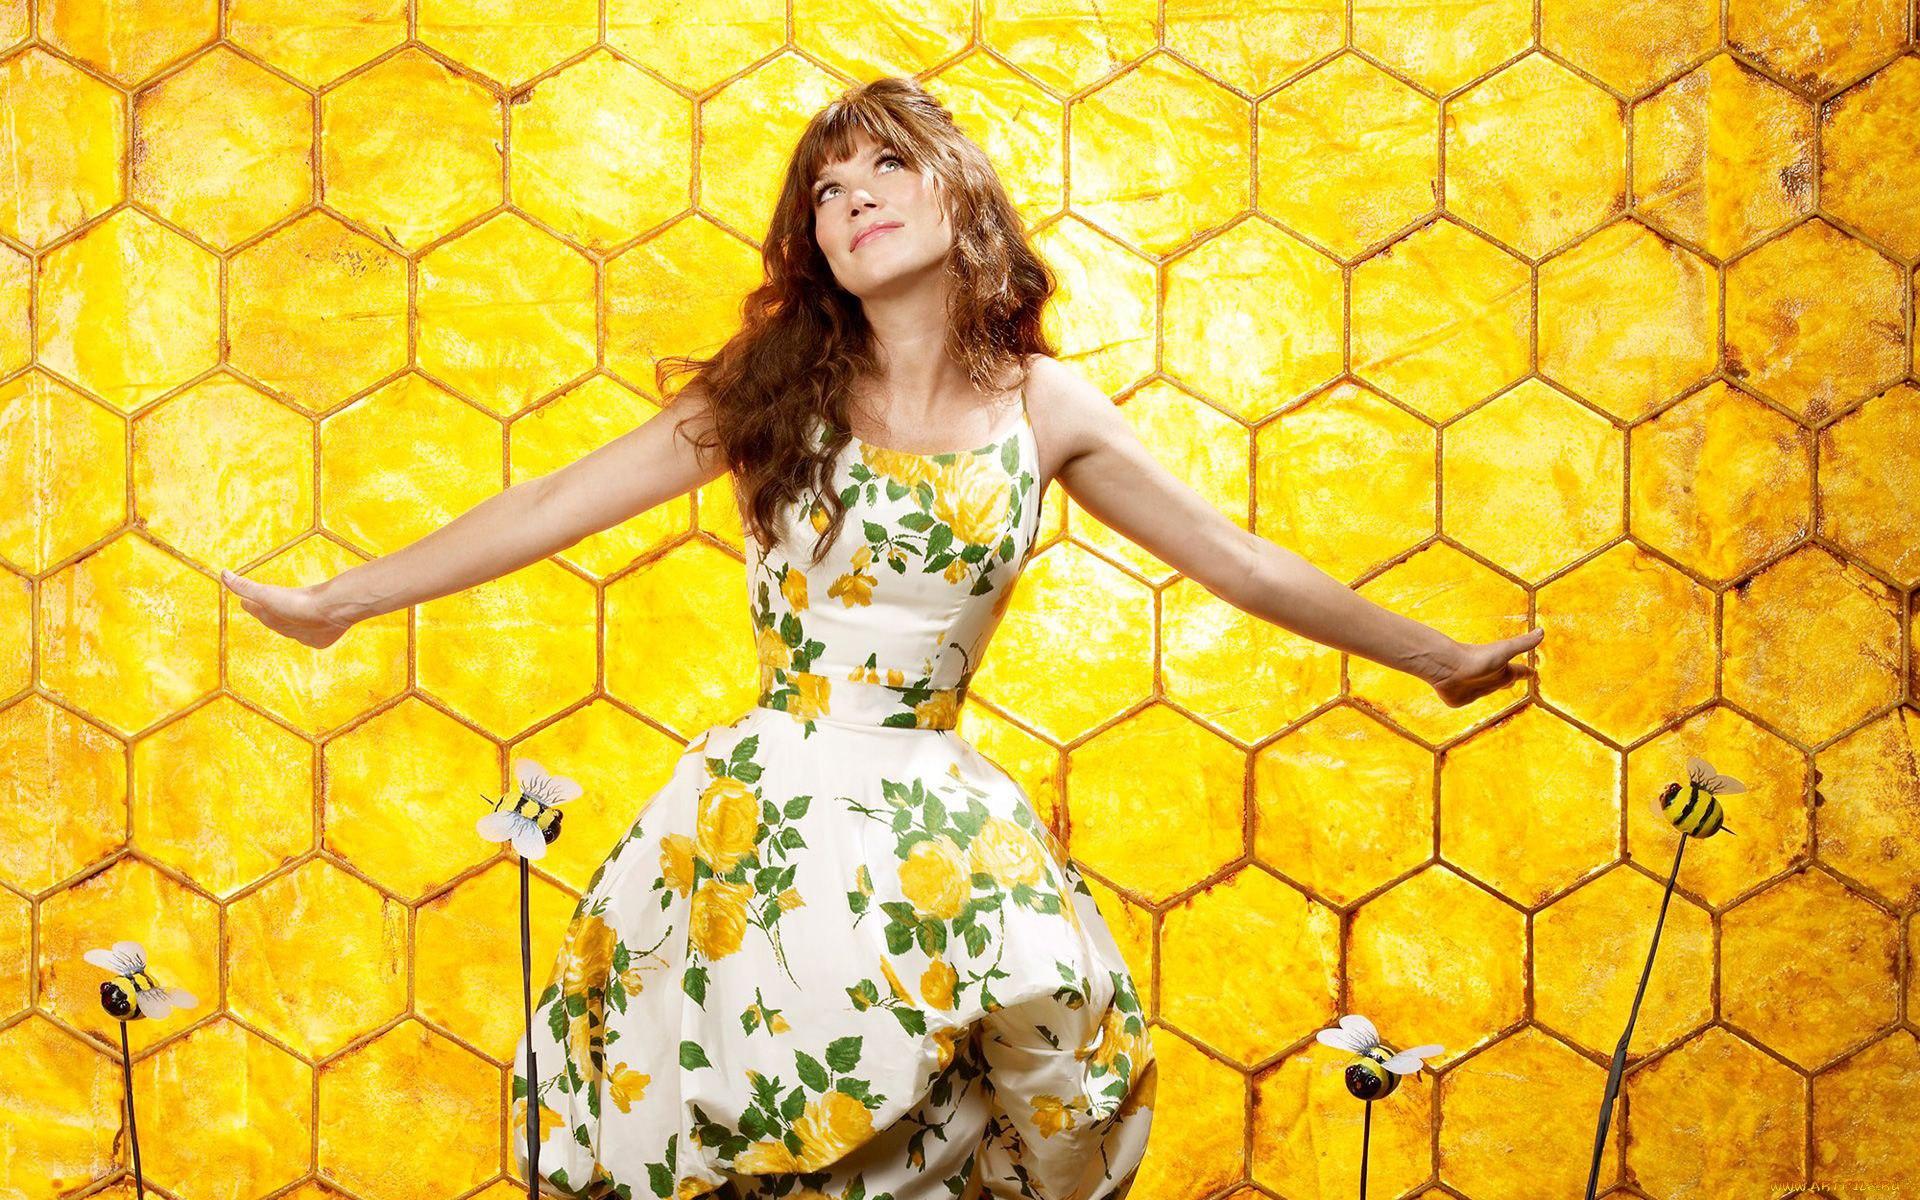 Преимущества мёда в сезон сбора